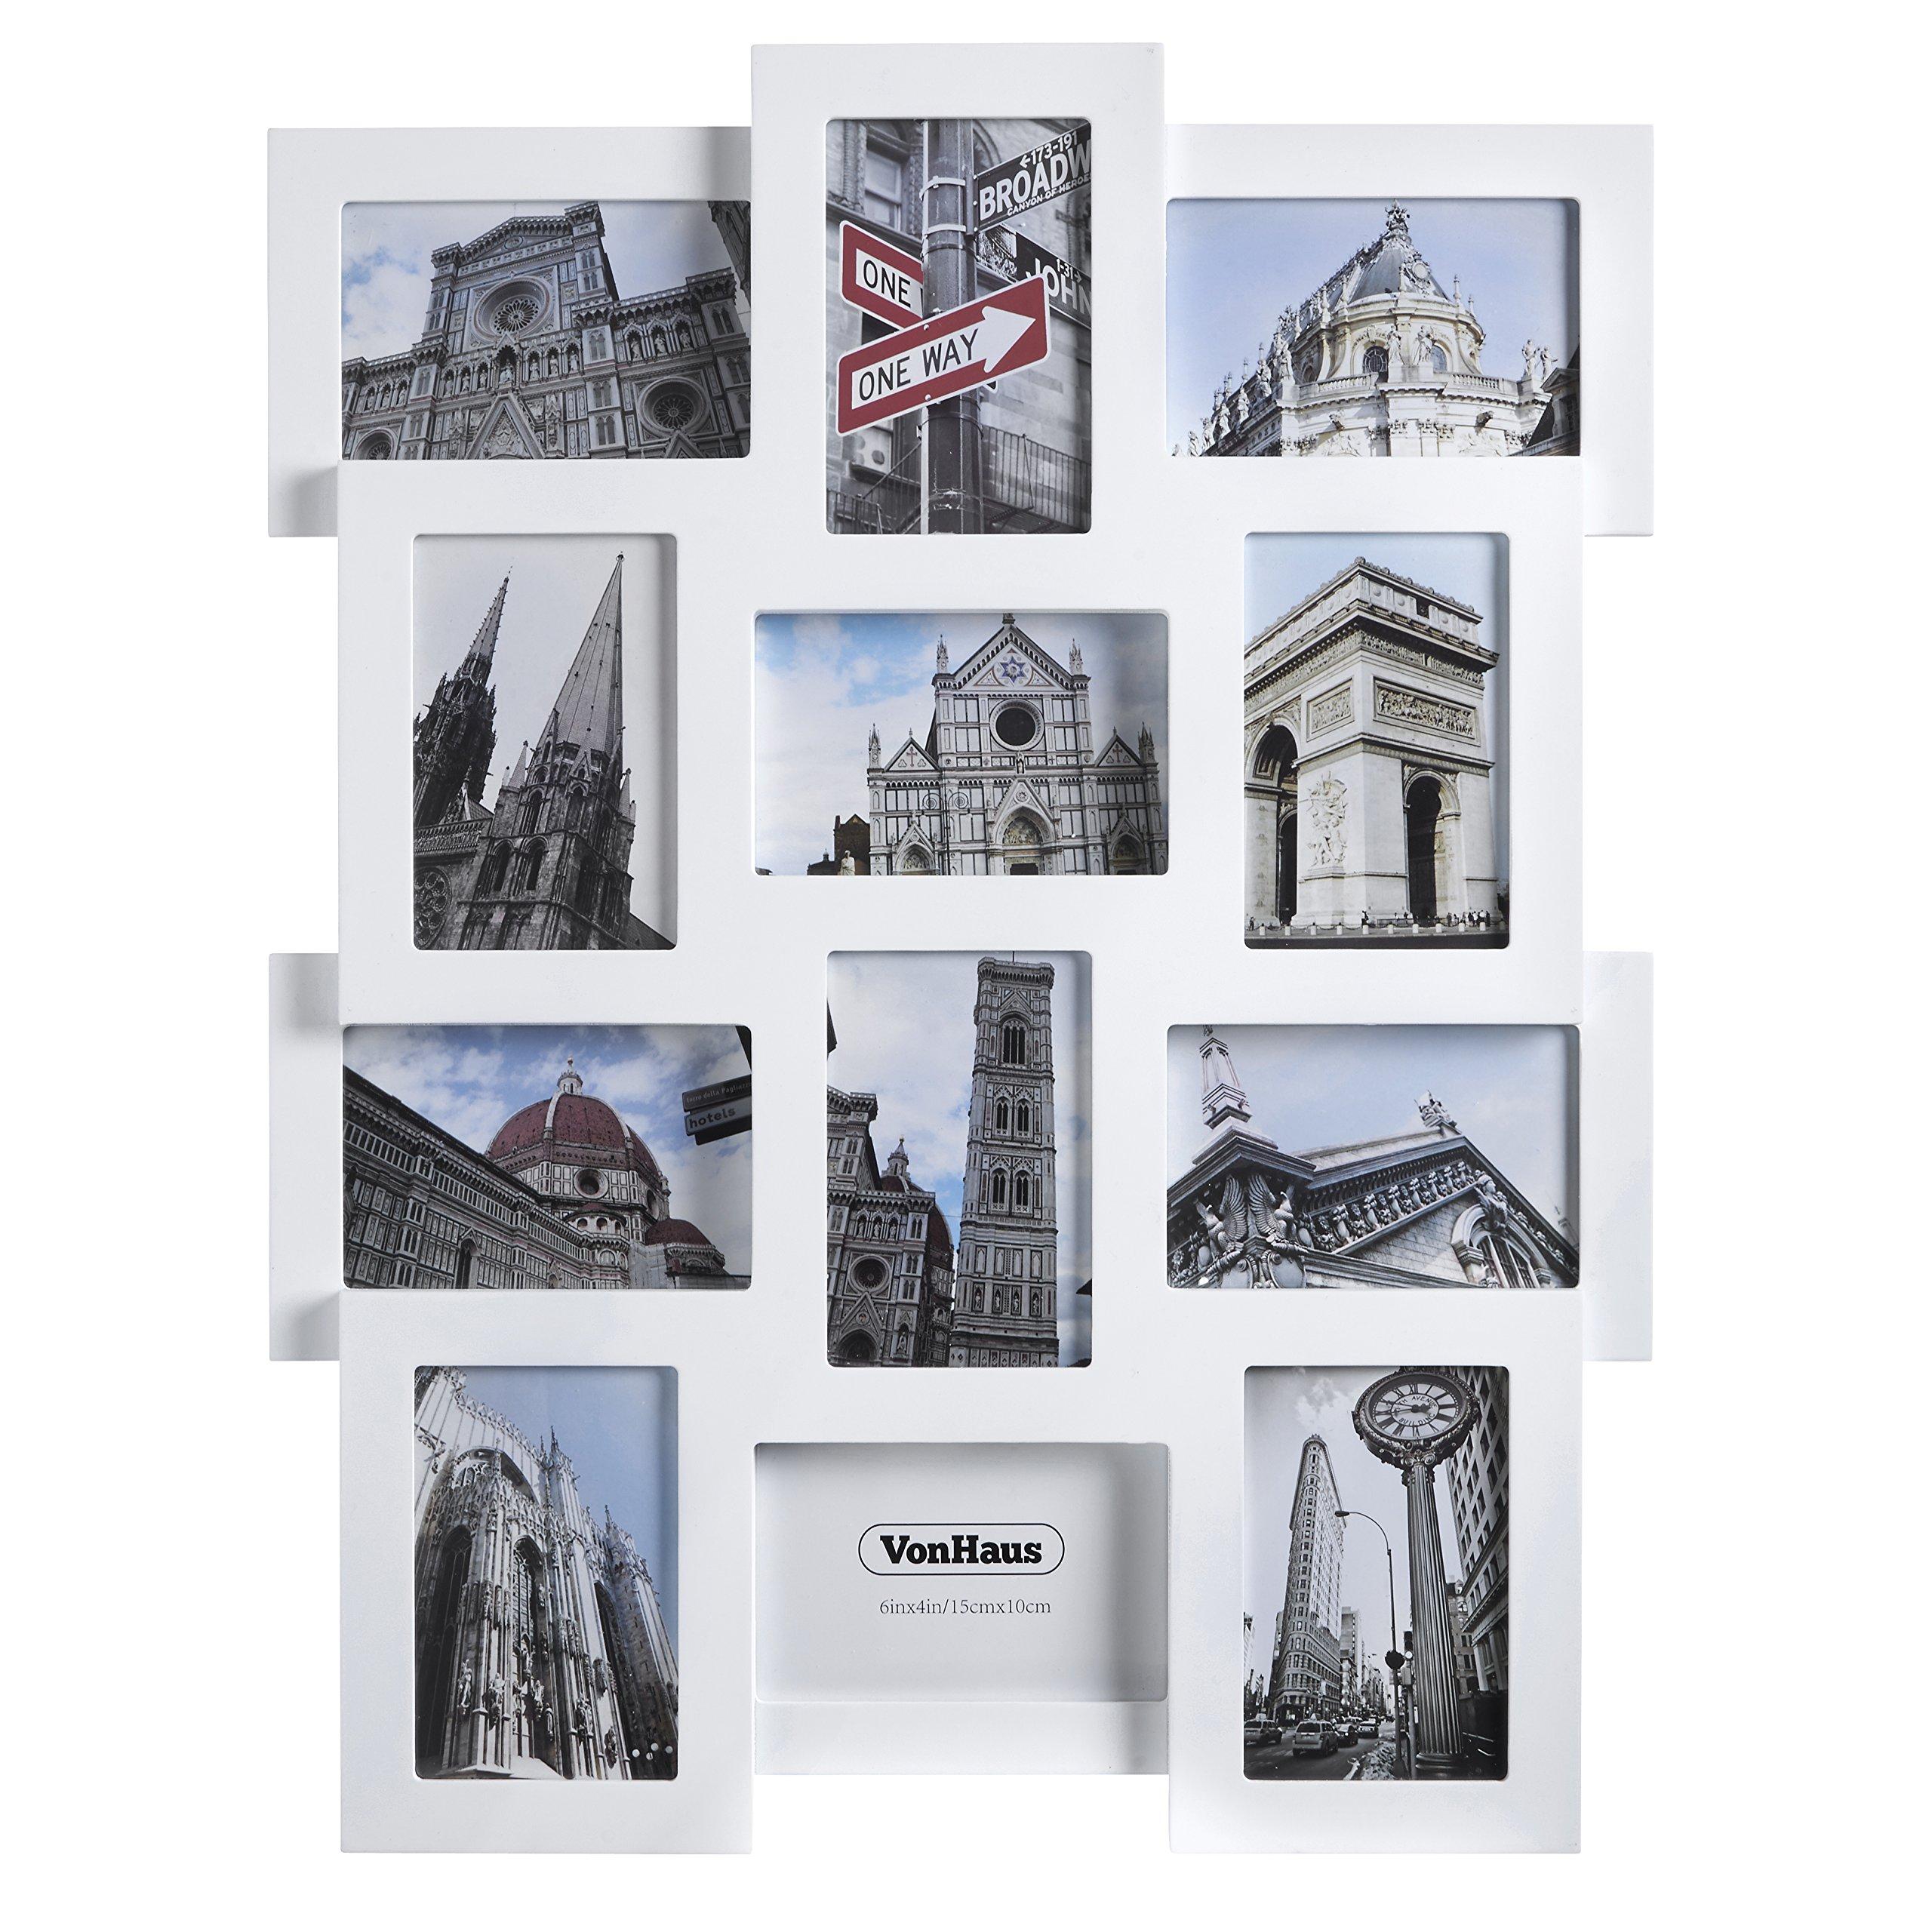 VonHaus Collage Picture Frames - Holds 12 Photographs - for 6 x 4 Photographs by VonHaus